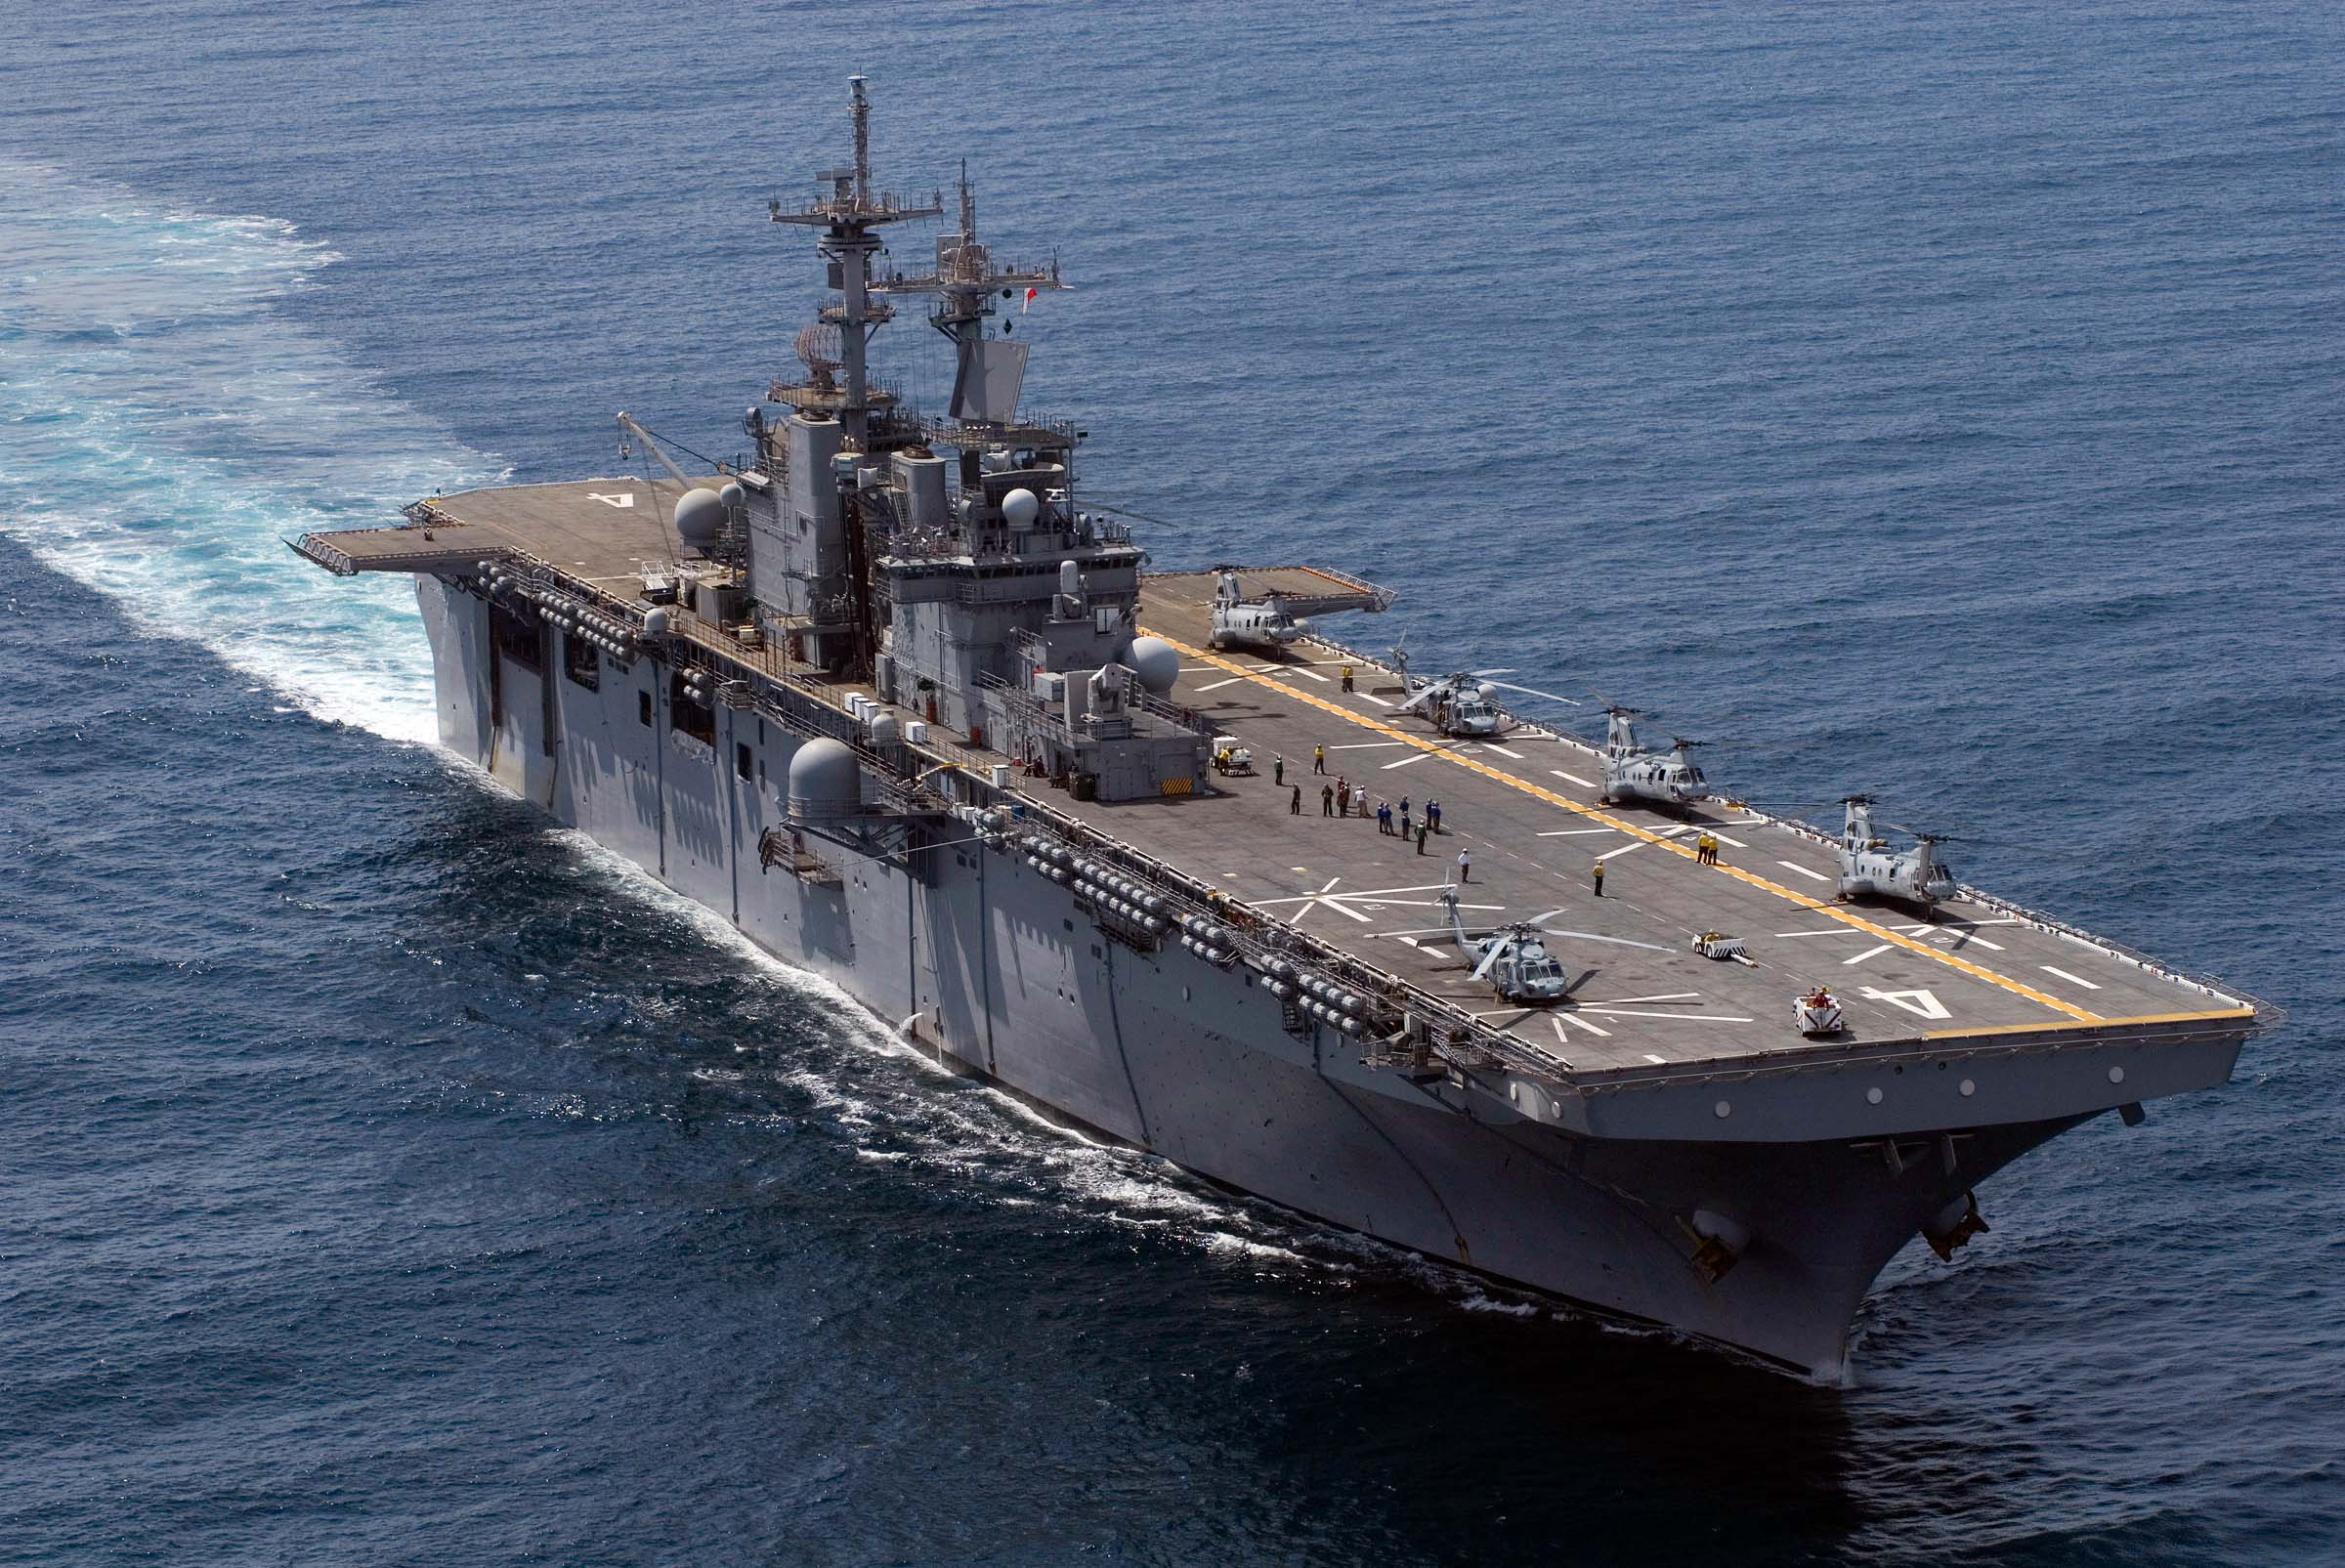 USS BOXER LHD-4 Bild: U.S. Navy